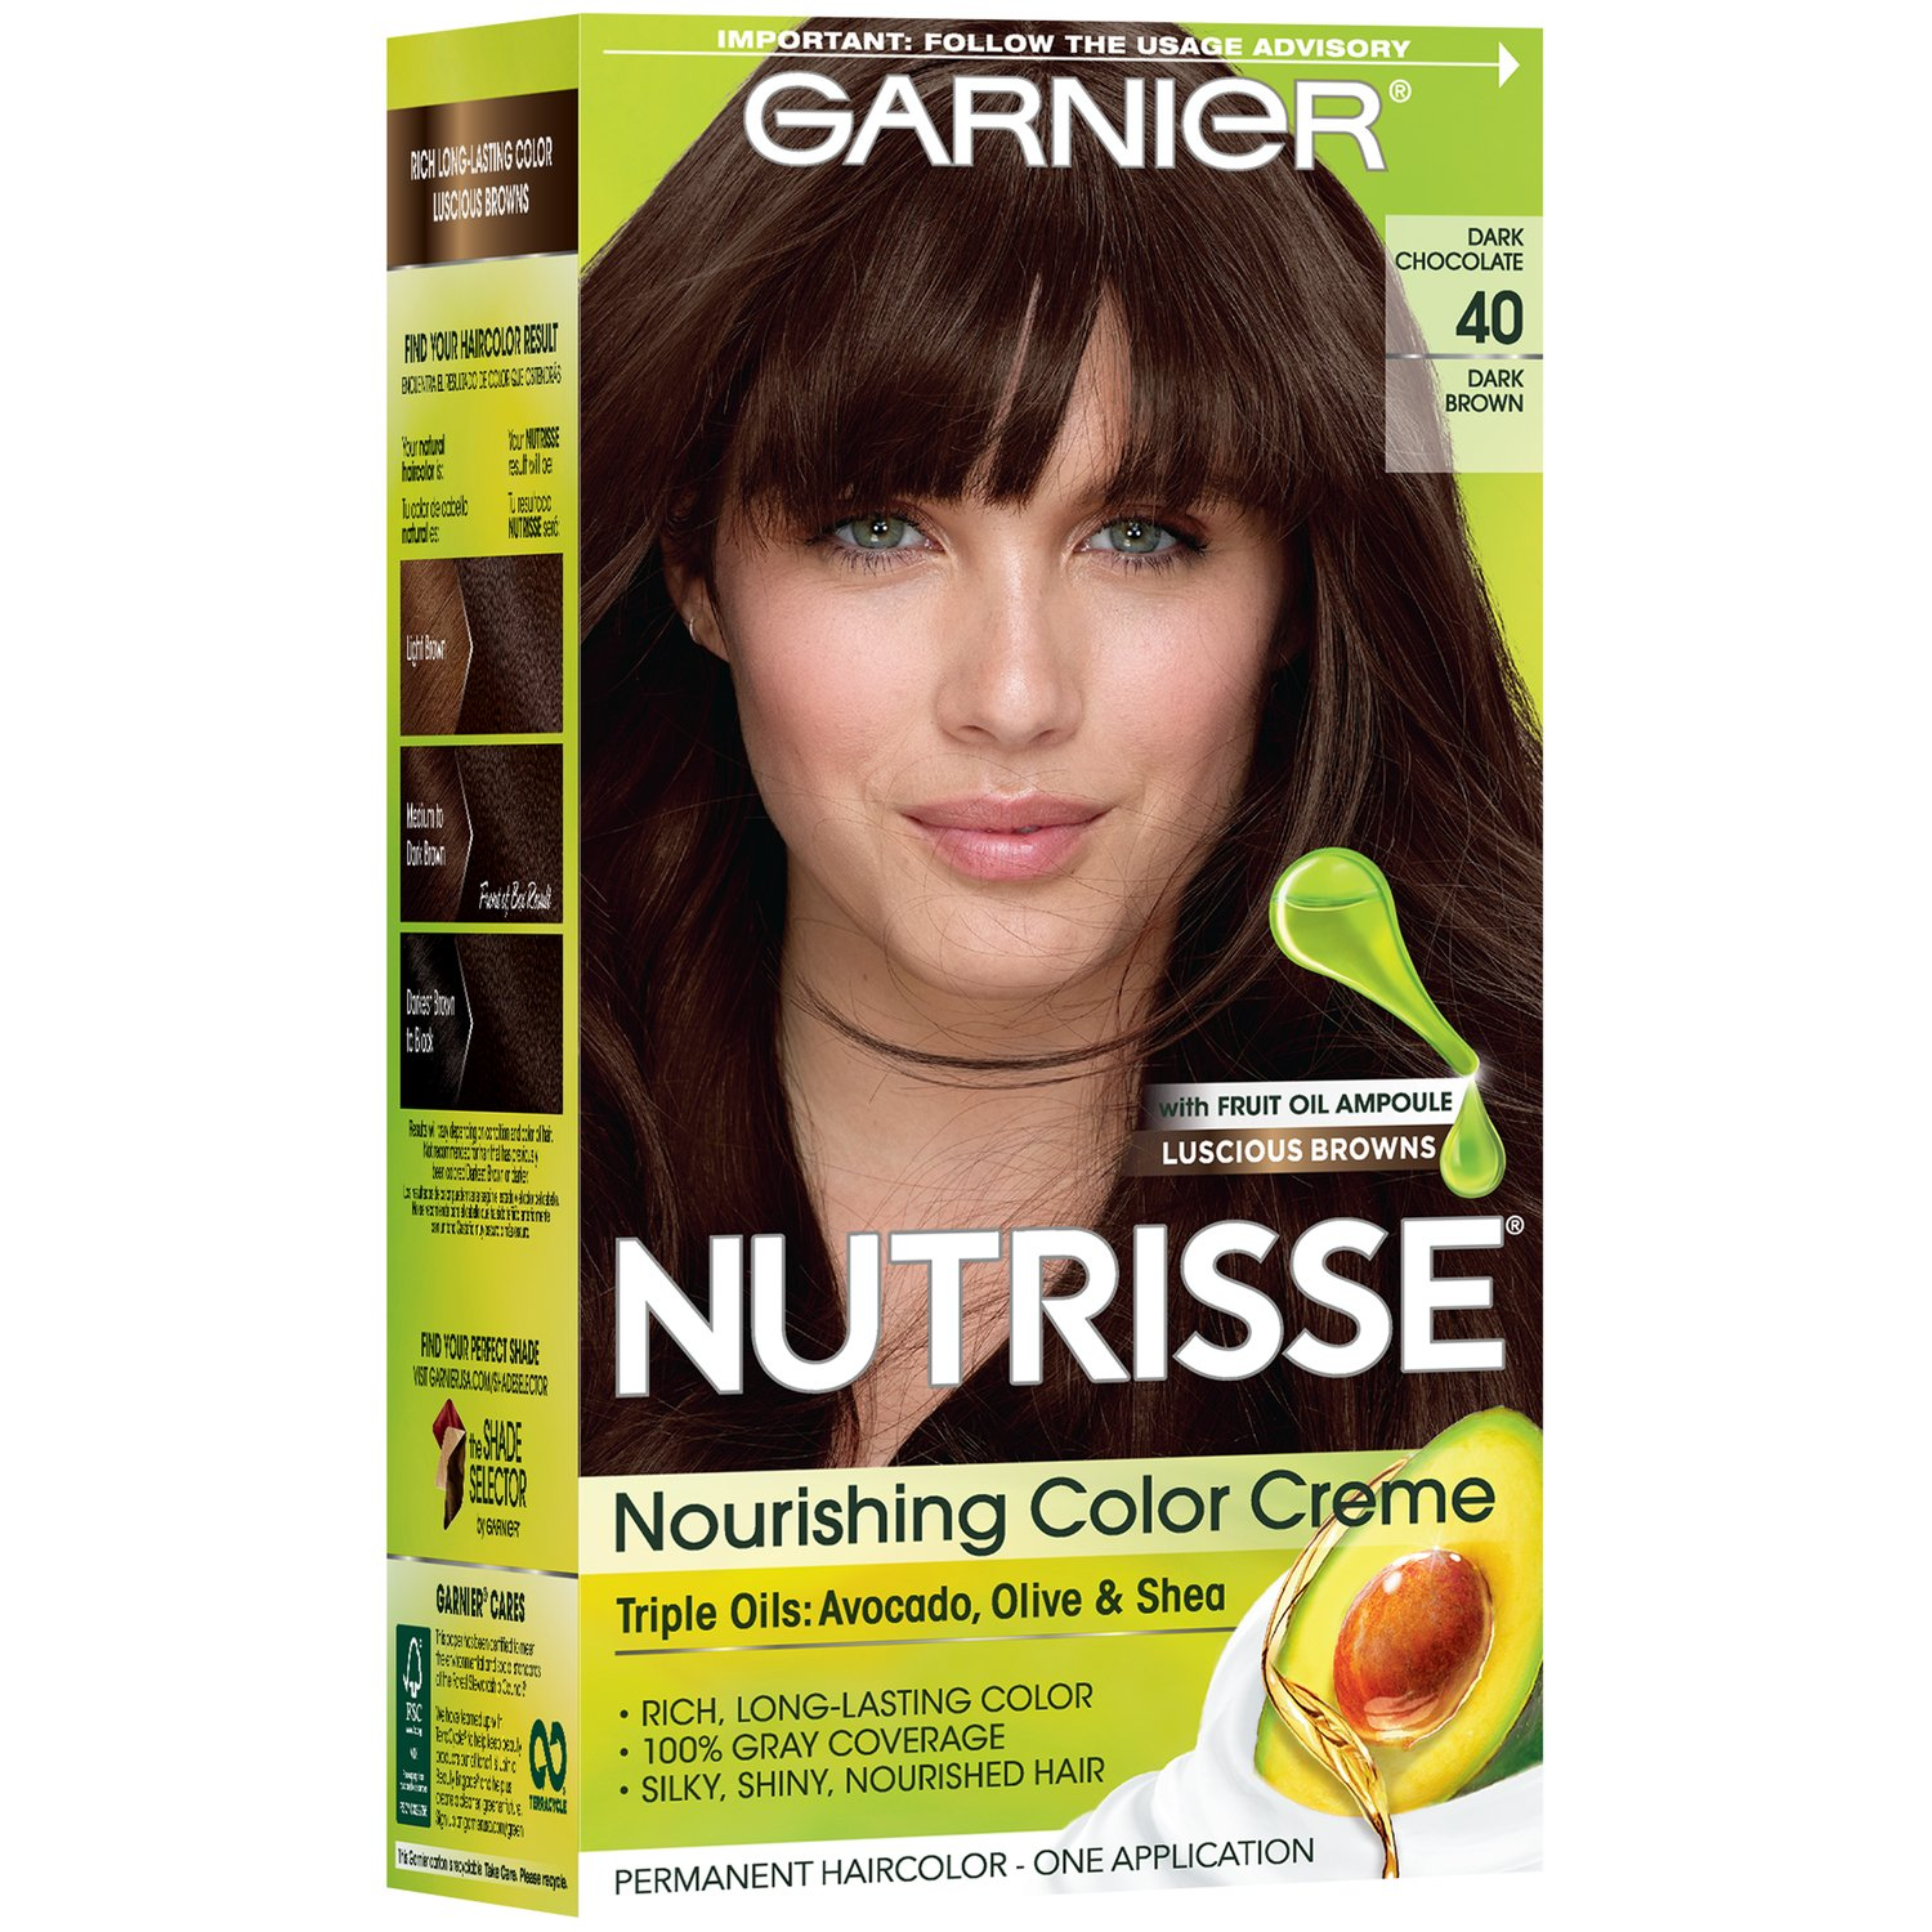 Garnier Nutrisse Nourishing Hair Color Creme 40 Dark Brown Dark Chocolate Shop Hair Color At H E B,Blue And White Porcelain Decorating Ideas